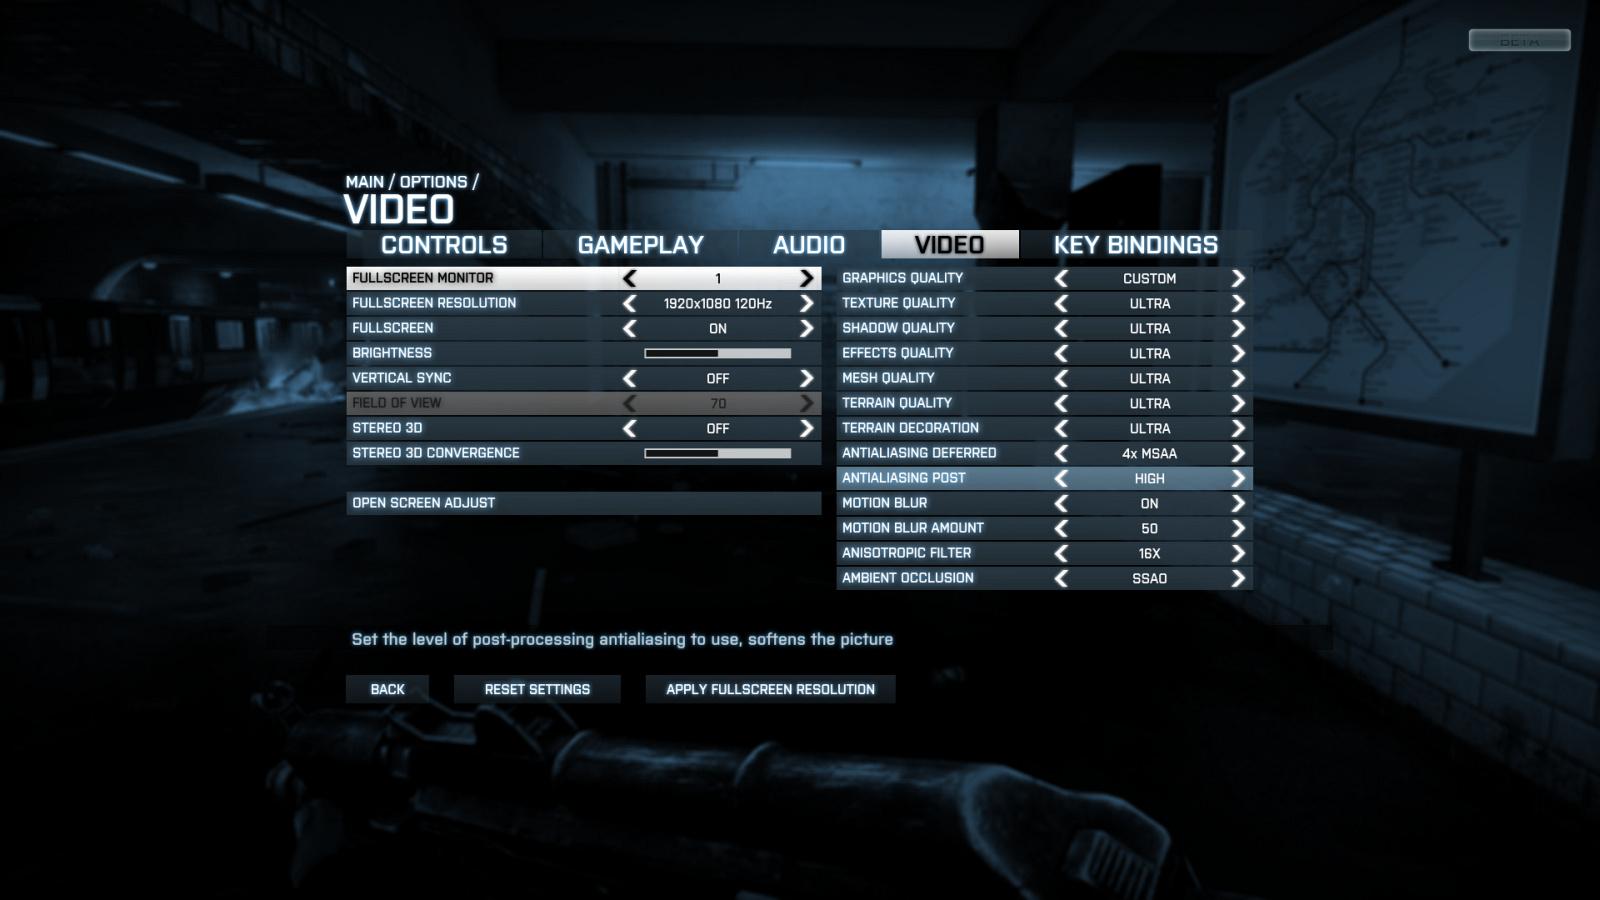 Beta Battlefieldu 3 je live – hratelnost, grafika, galerie 52485